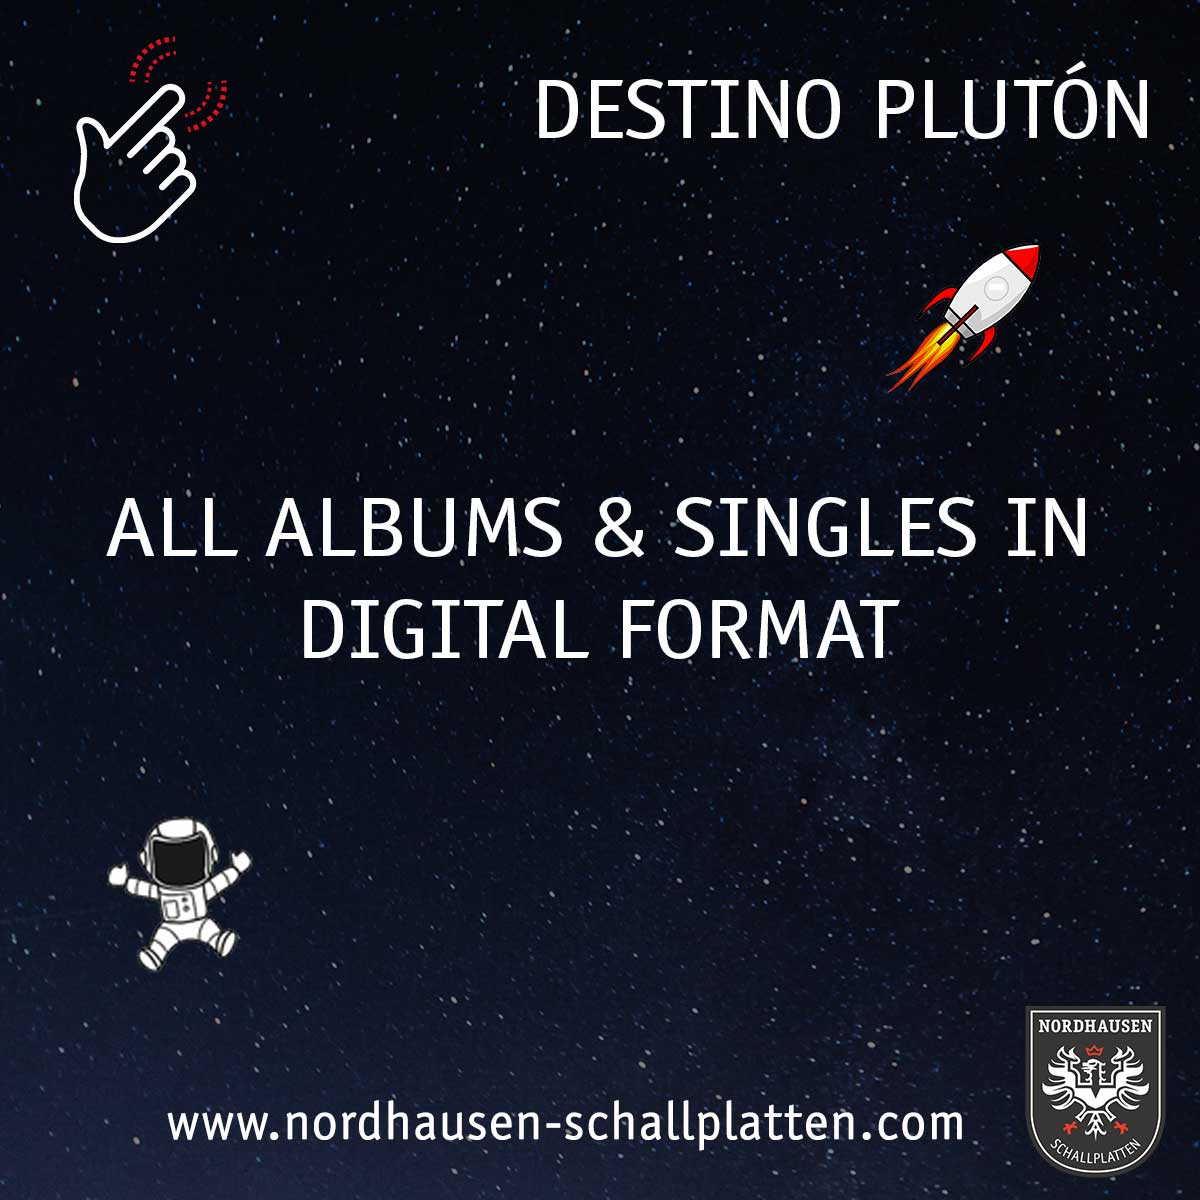 Destino Plutón